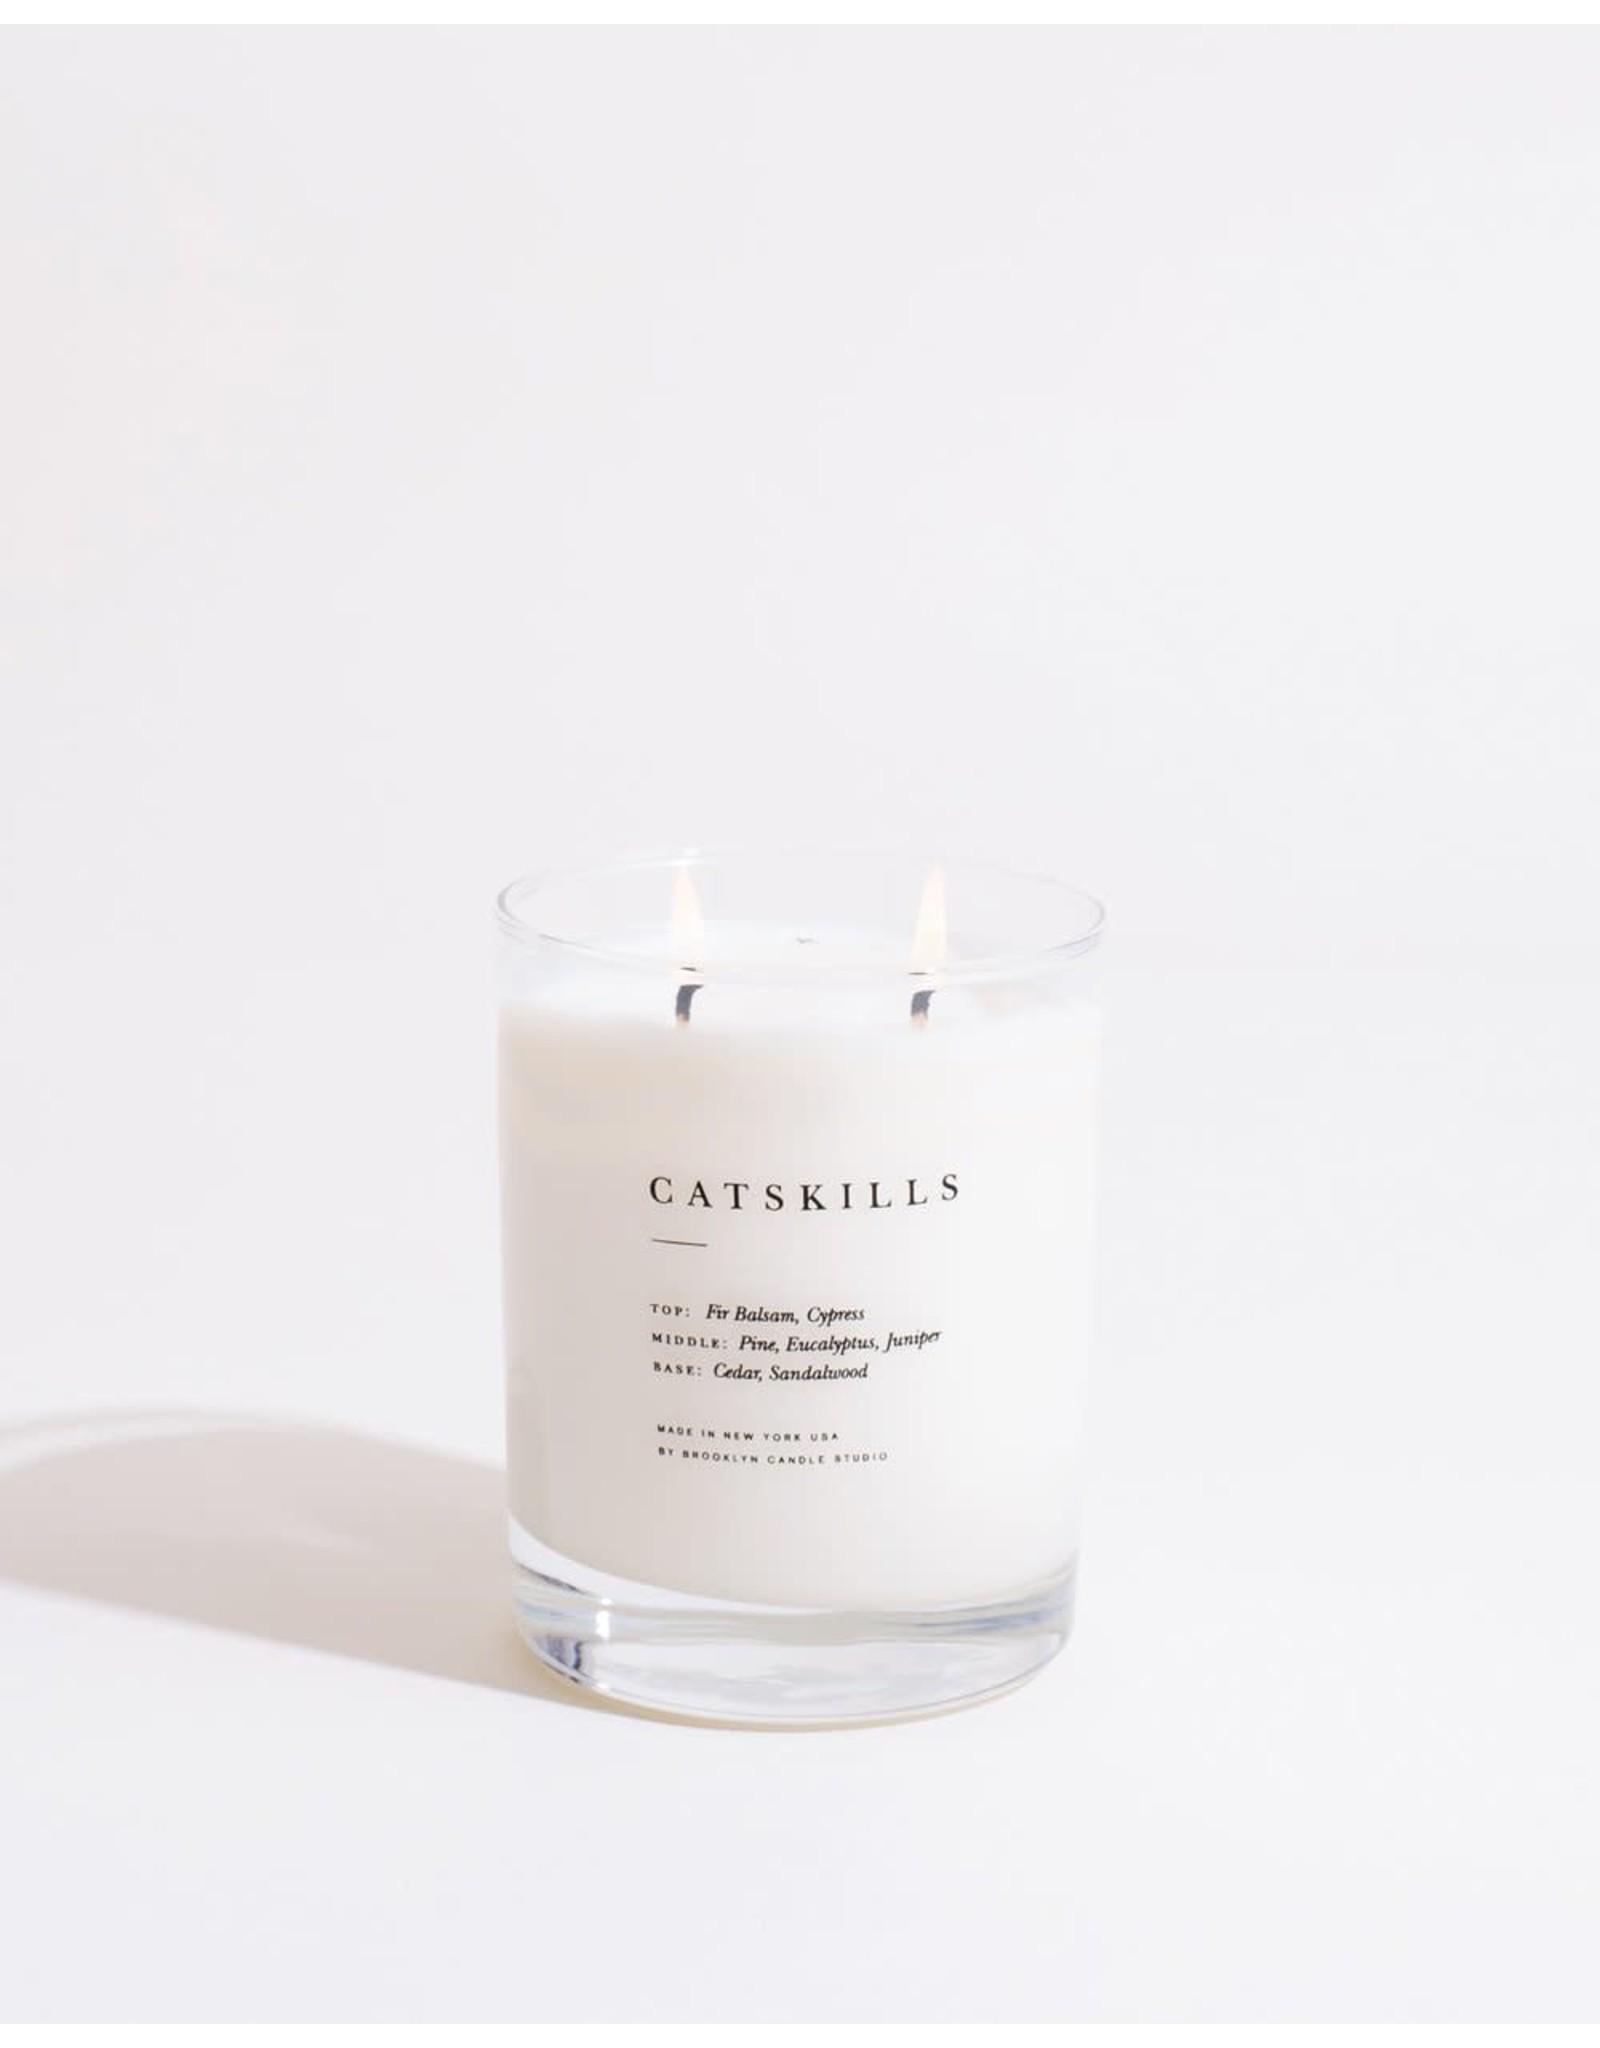 Brooklyn Candle Studio Catskills - Escapist Candle - Brooklyn Candle Studio